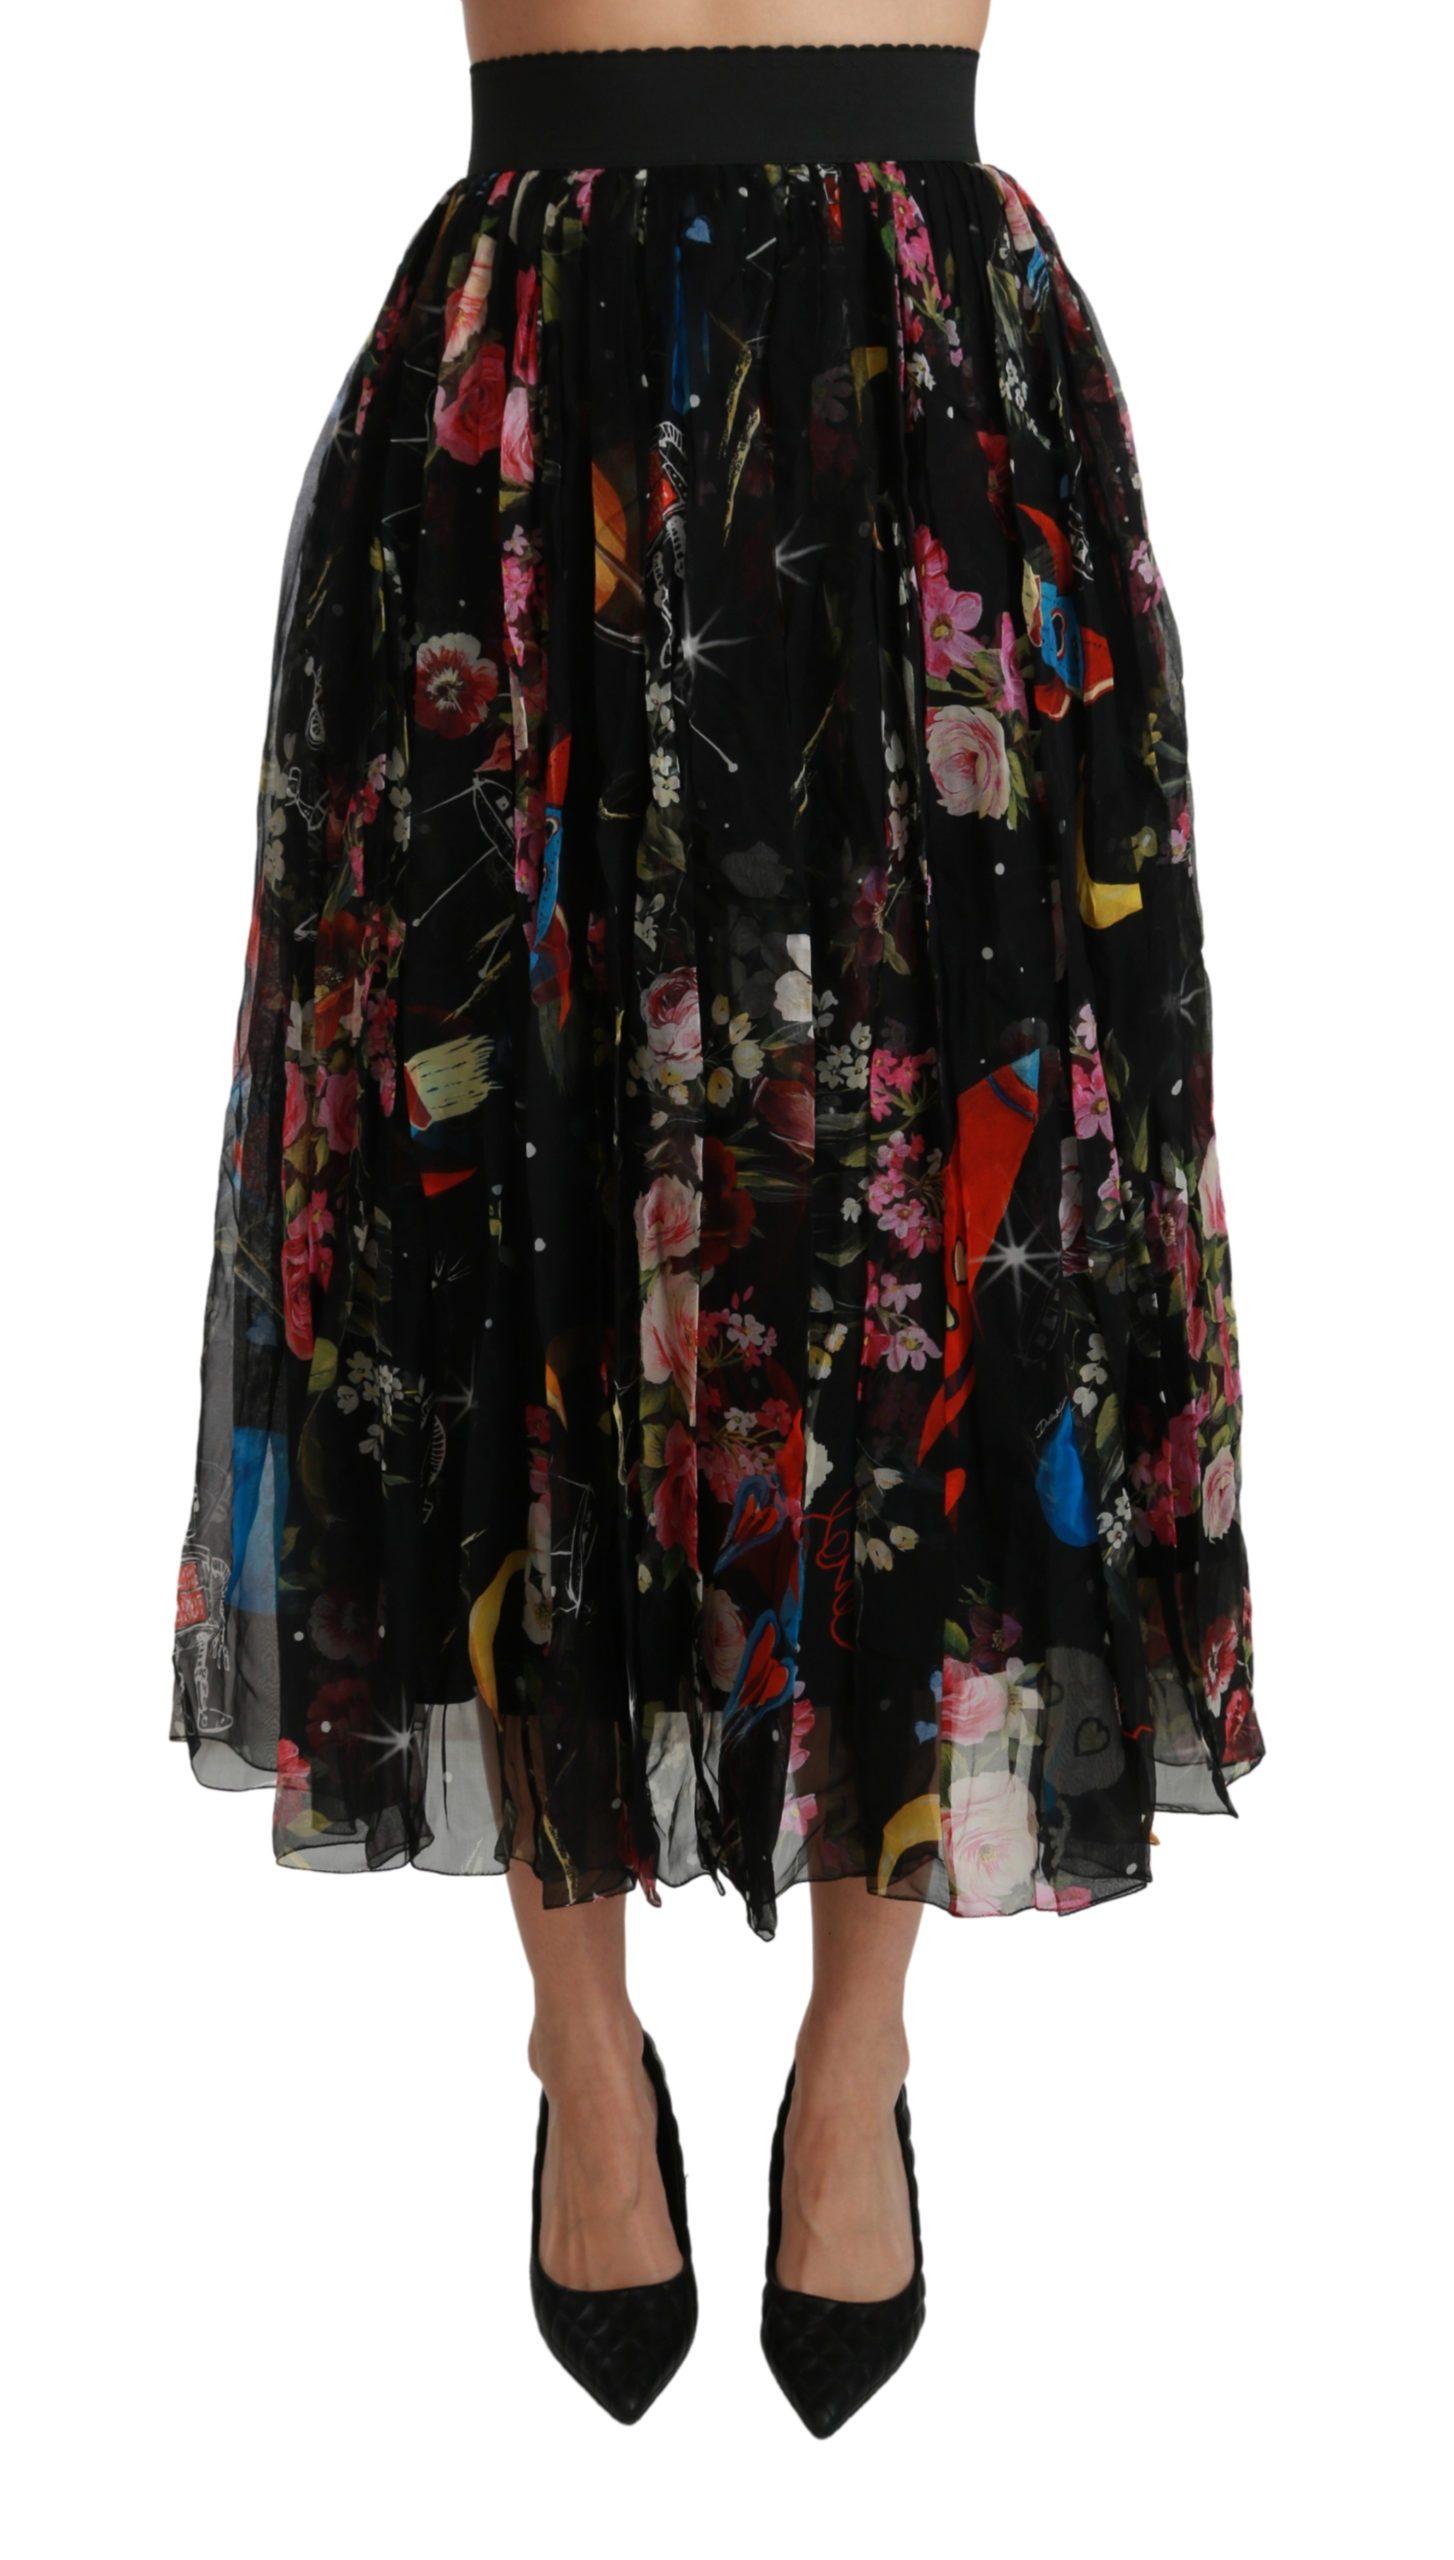 Dolce & Gabbana Women's Floral High Waist Pleated Skirt Black SKI1405 - IT44|L